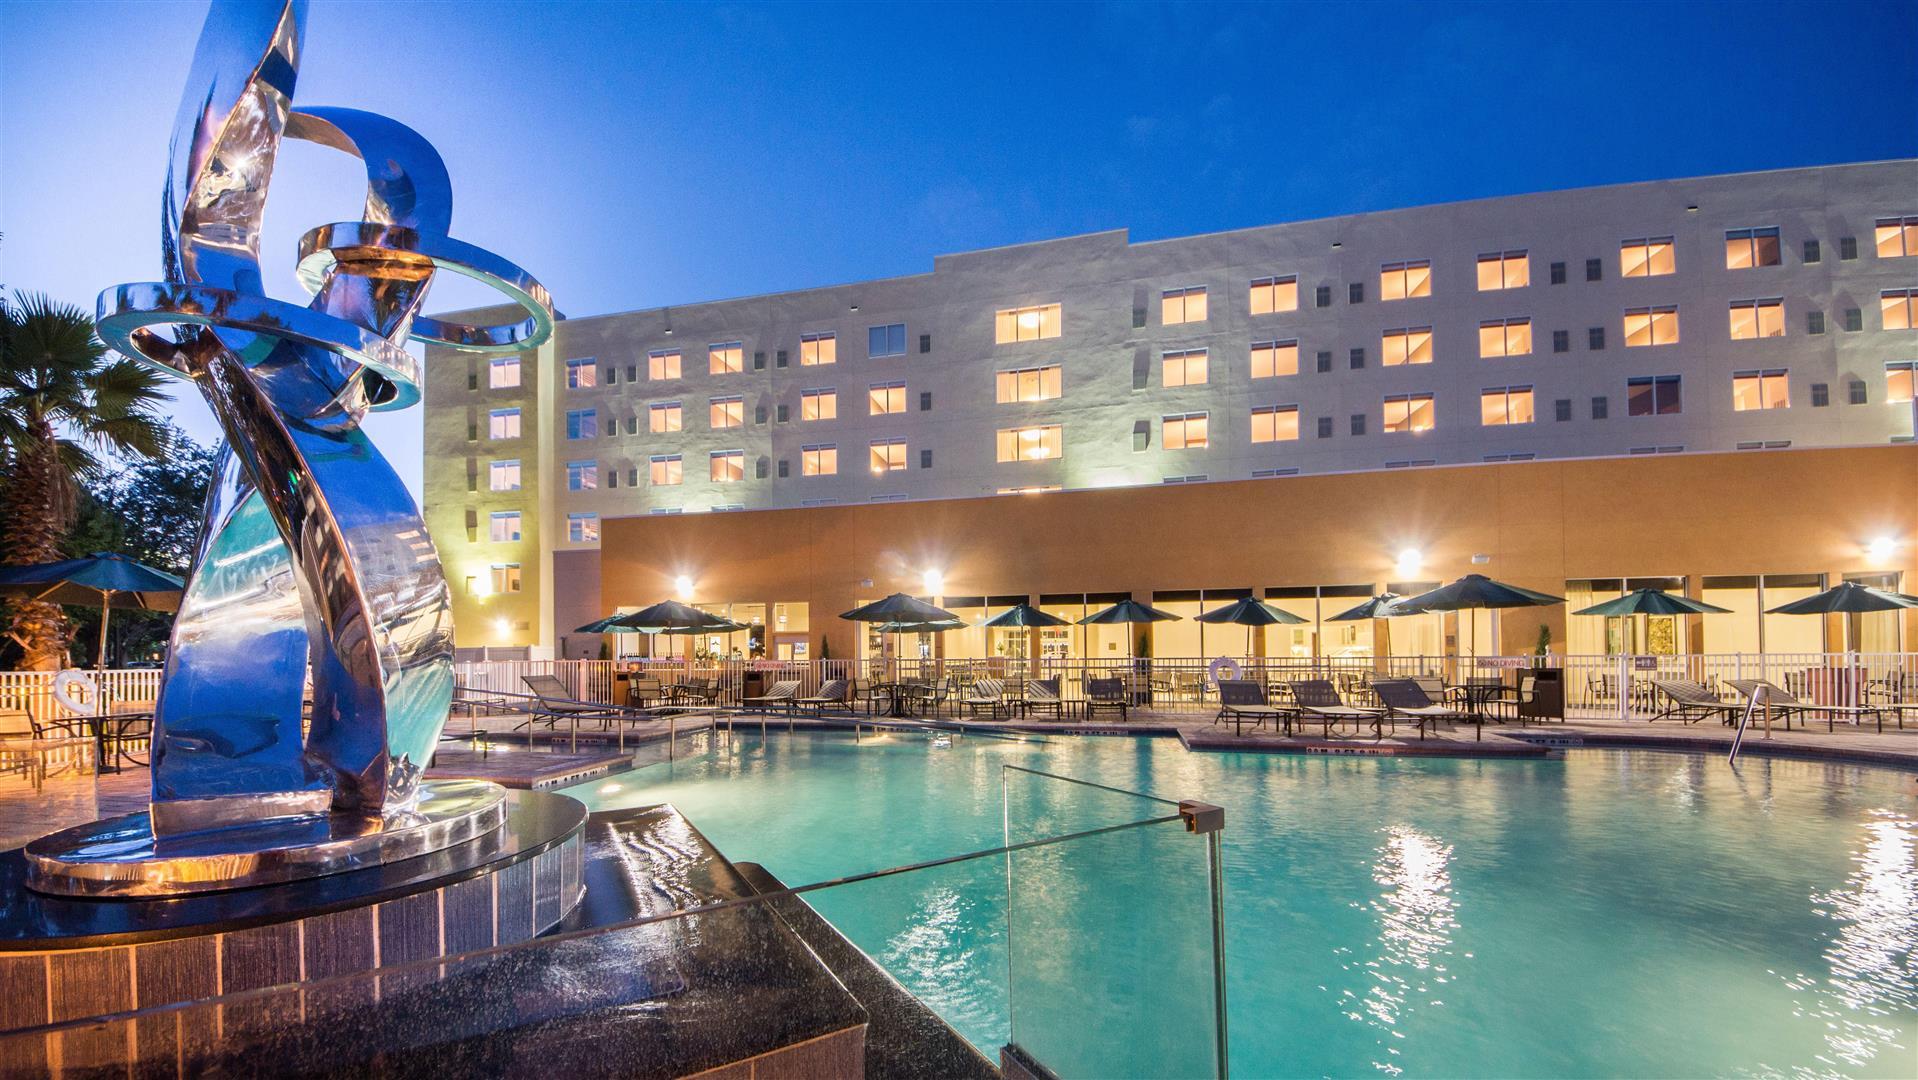 6e4683f6 Meetings and events at Hyatt Place Orlando/Lake Buena Vista, Orlando ...